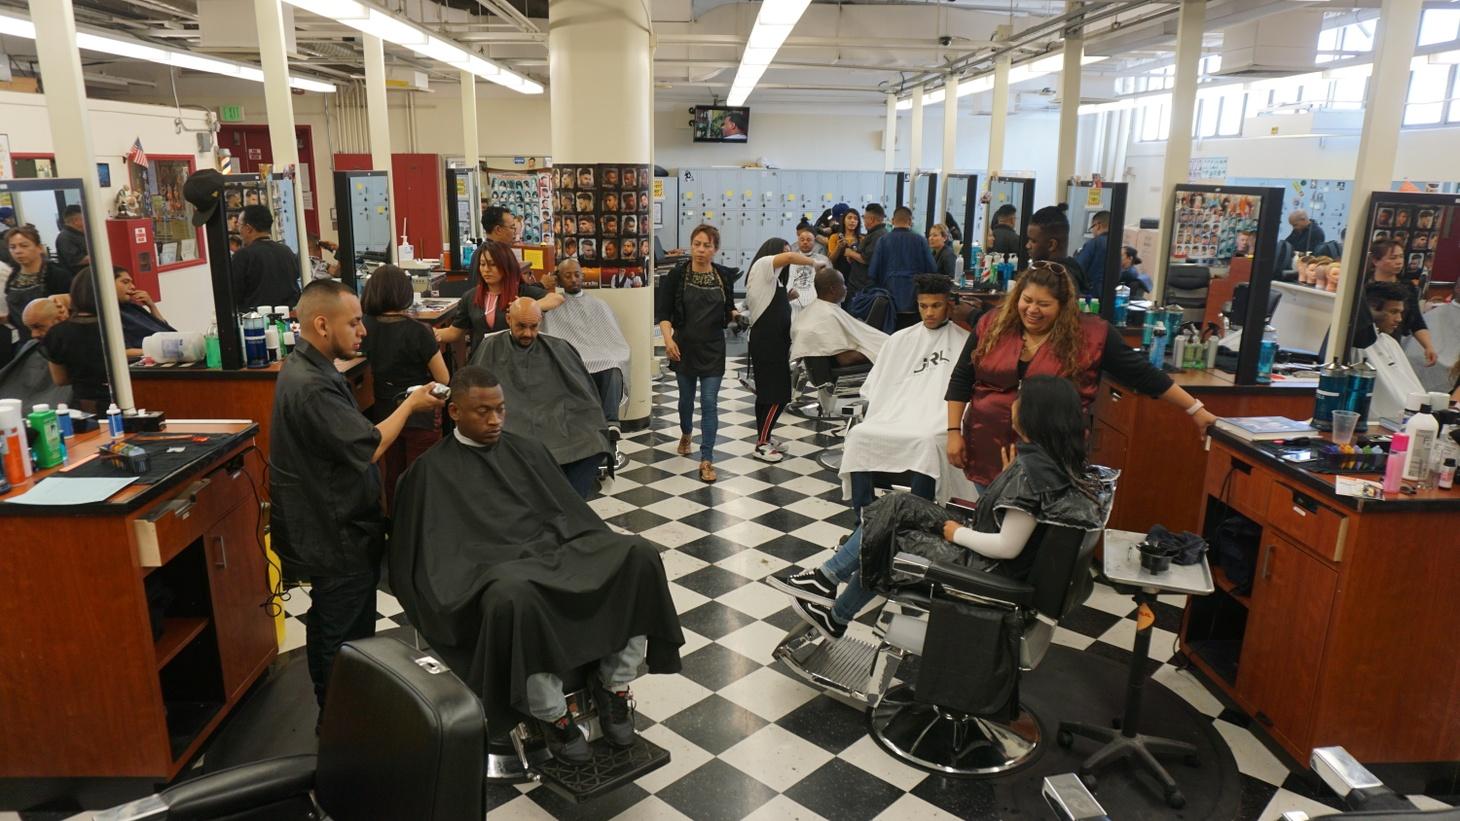 The bustling barbershop.